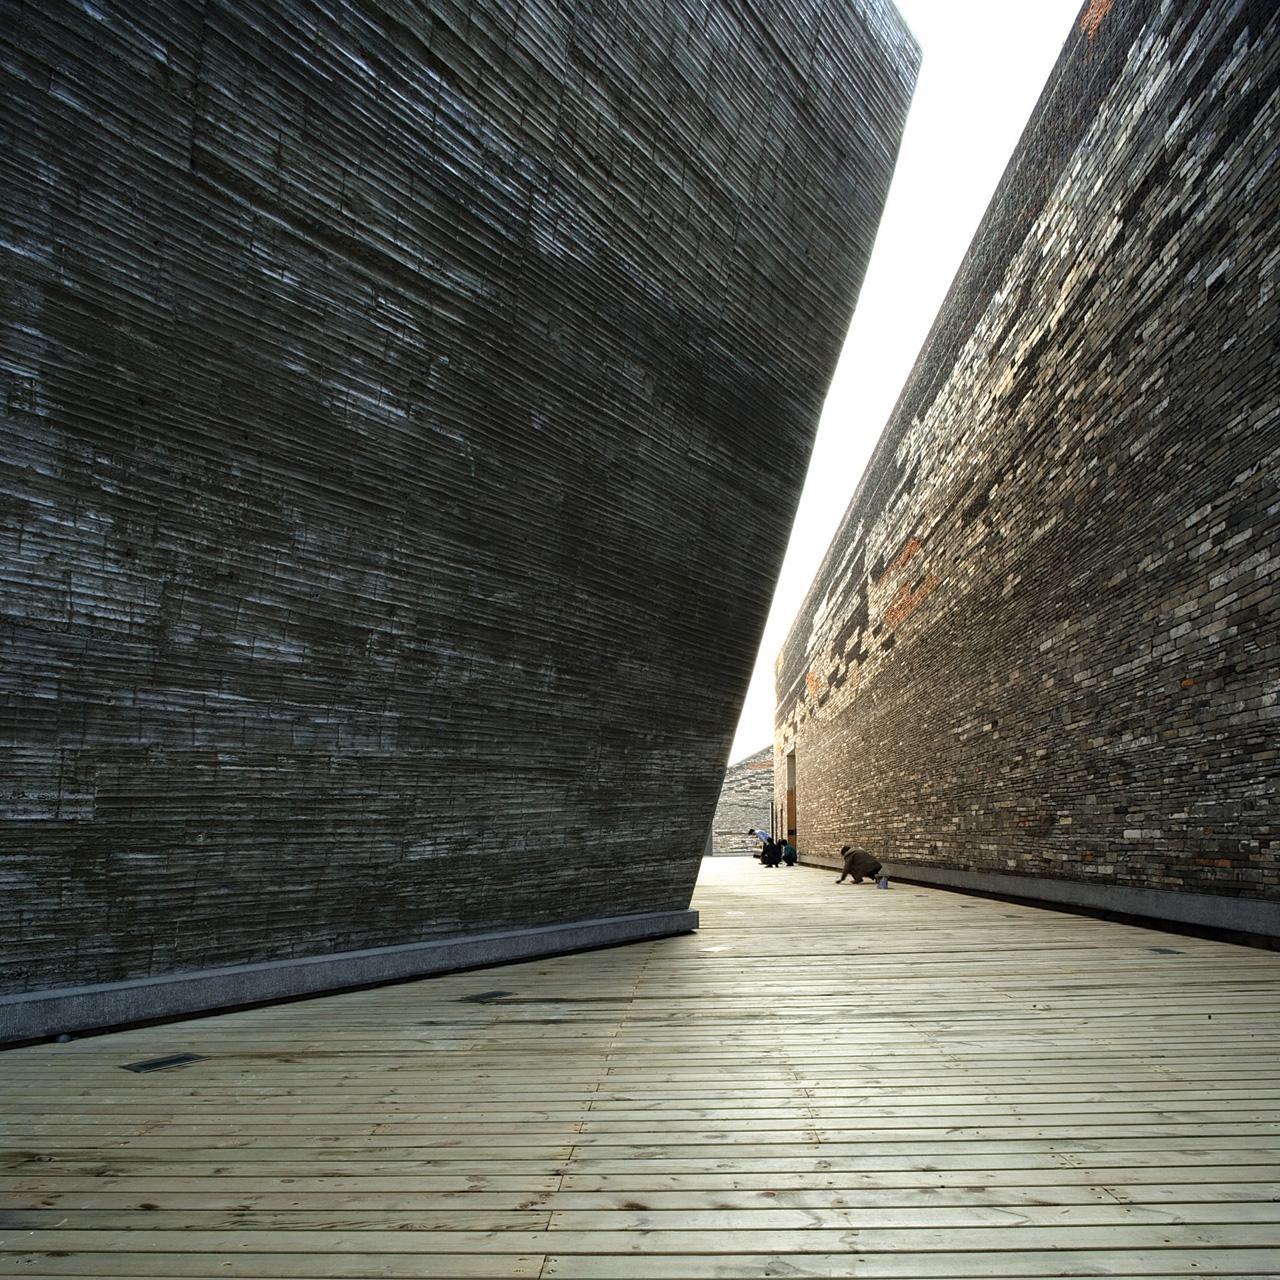 O trabalho de Wang Shu – Pritzker 2012, Museu Histórico de Ningbo © Lv Hengzhong, Cortesia de Amateur Architecture Studio